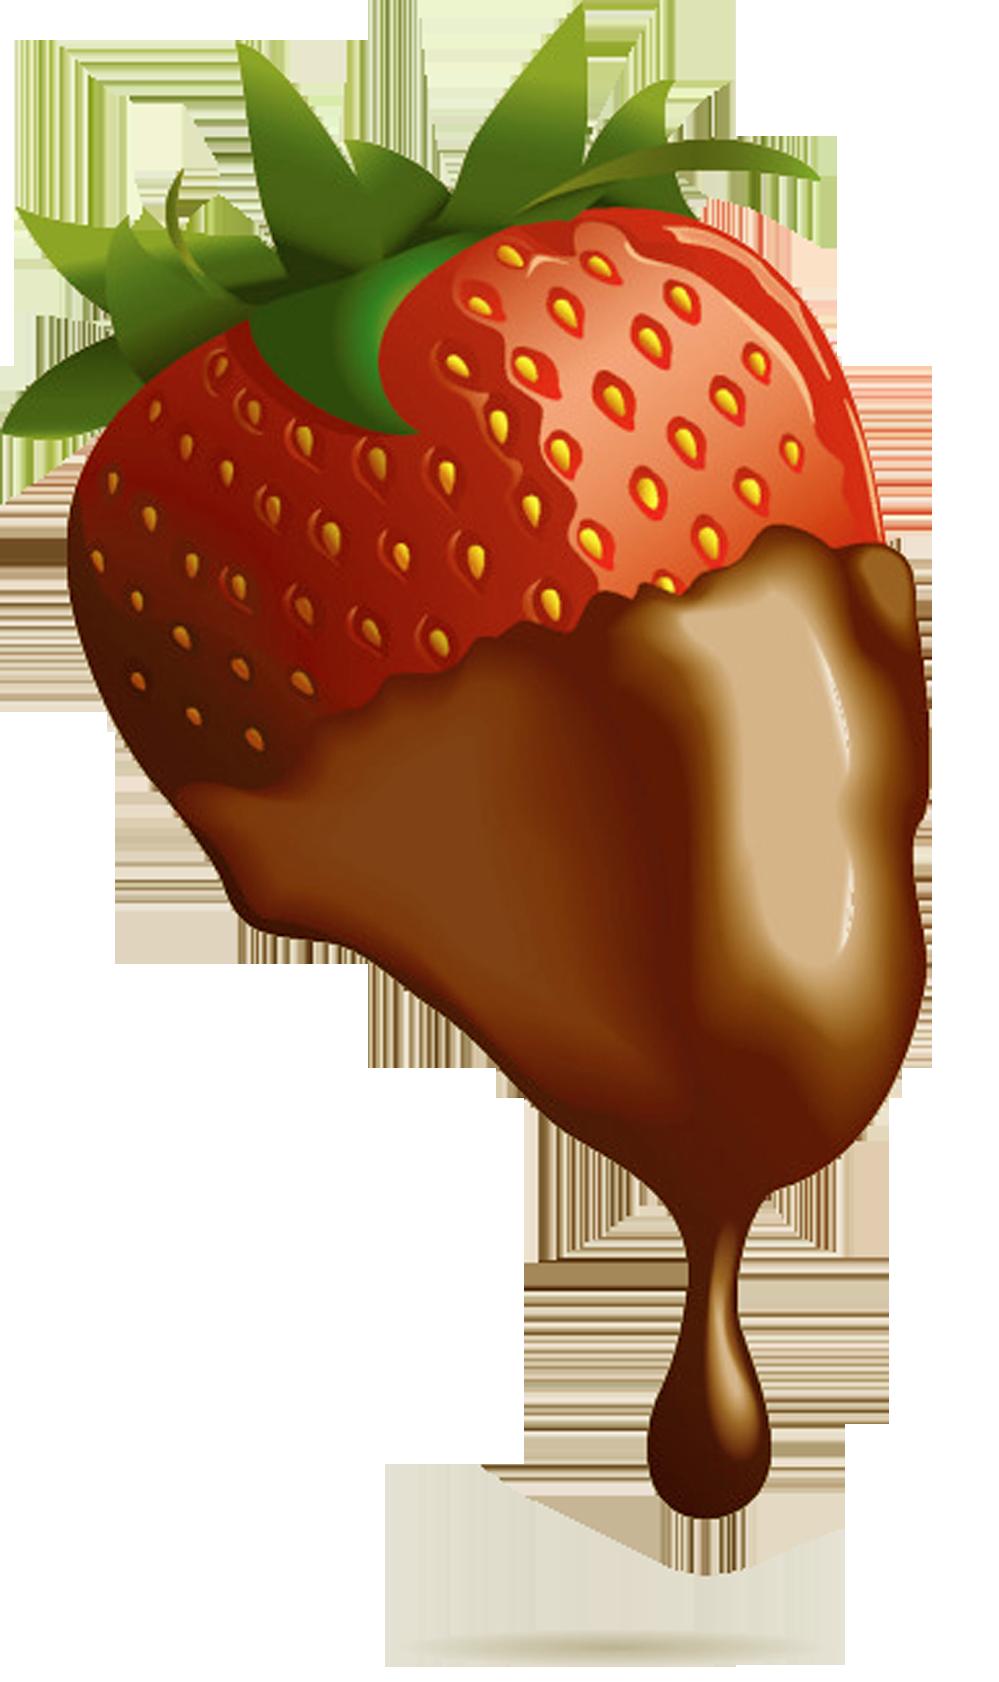 Strawberries clipart splash. Strawberry chocolate covered fruit